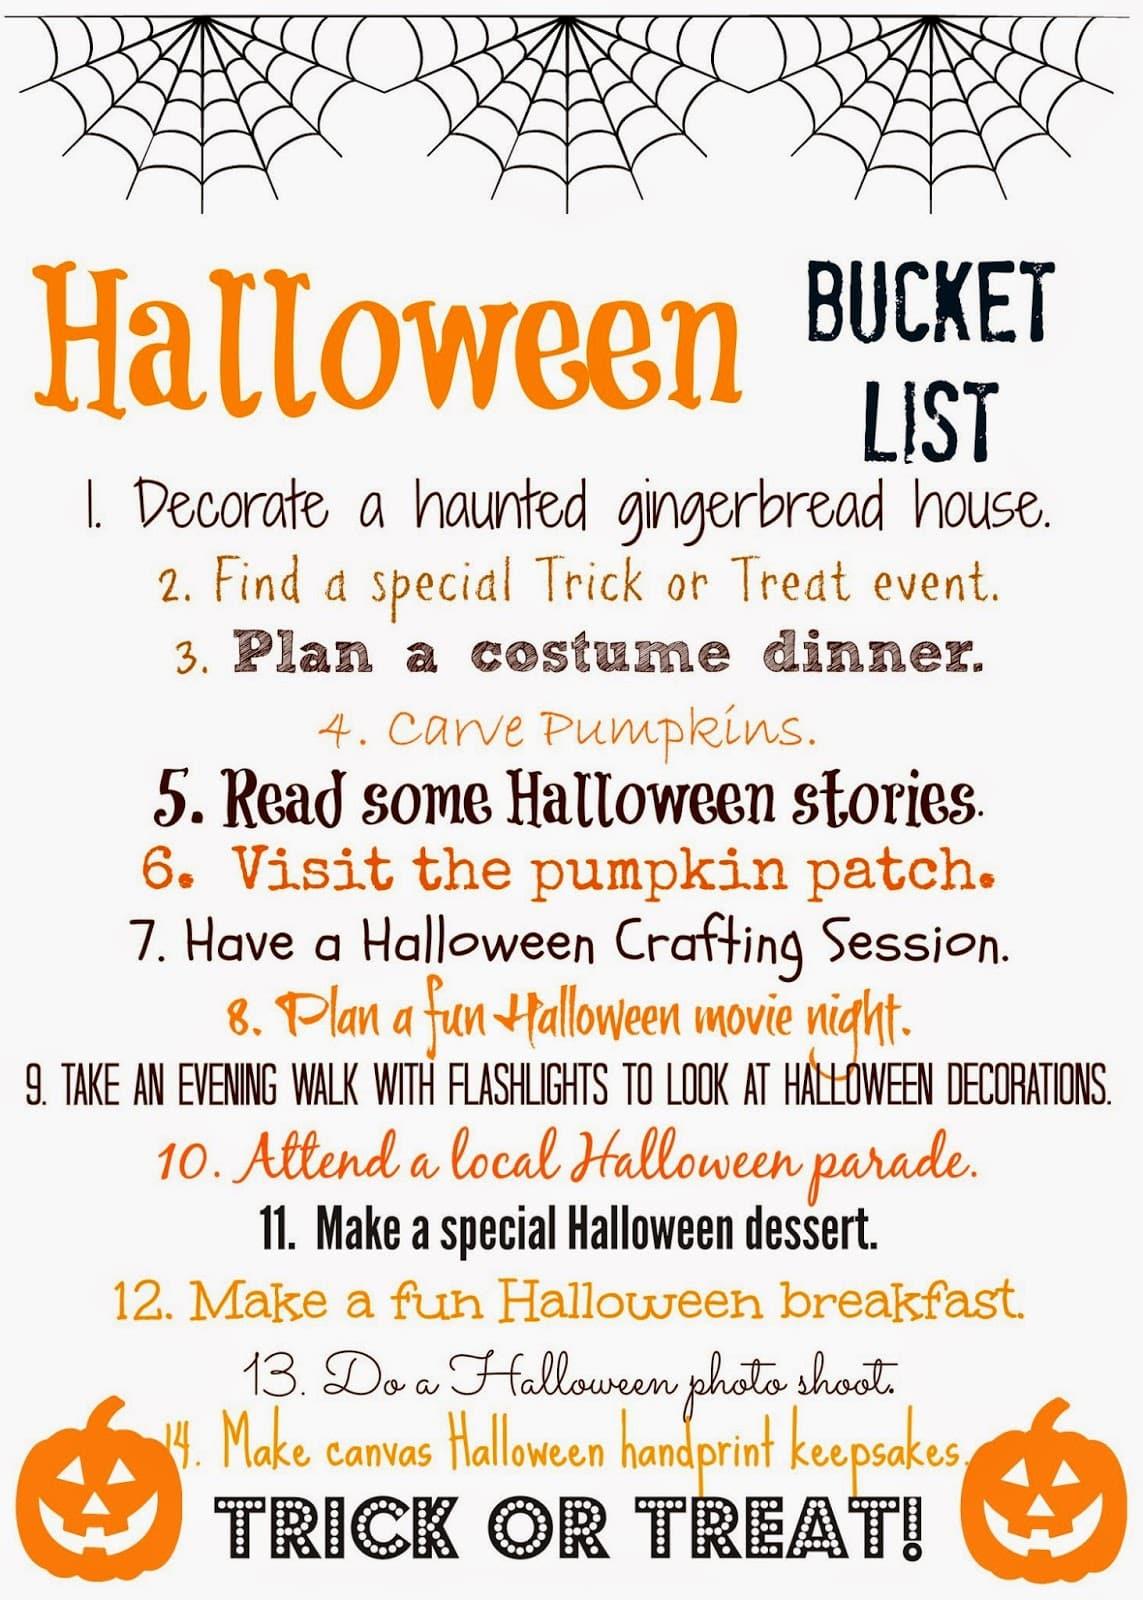 Halloween Bucket List Free Printable The Chirping Moms